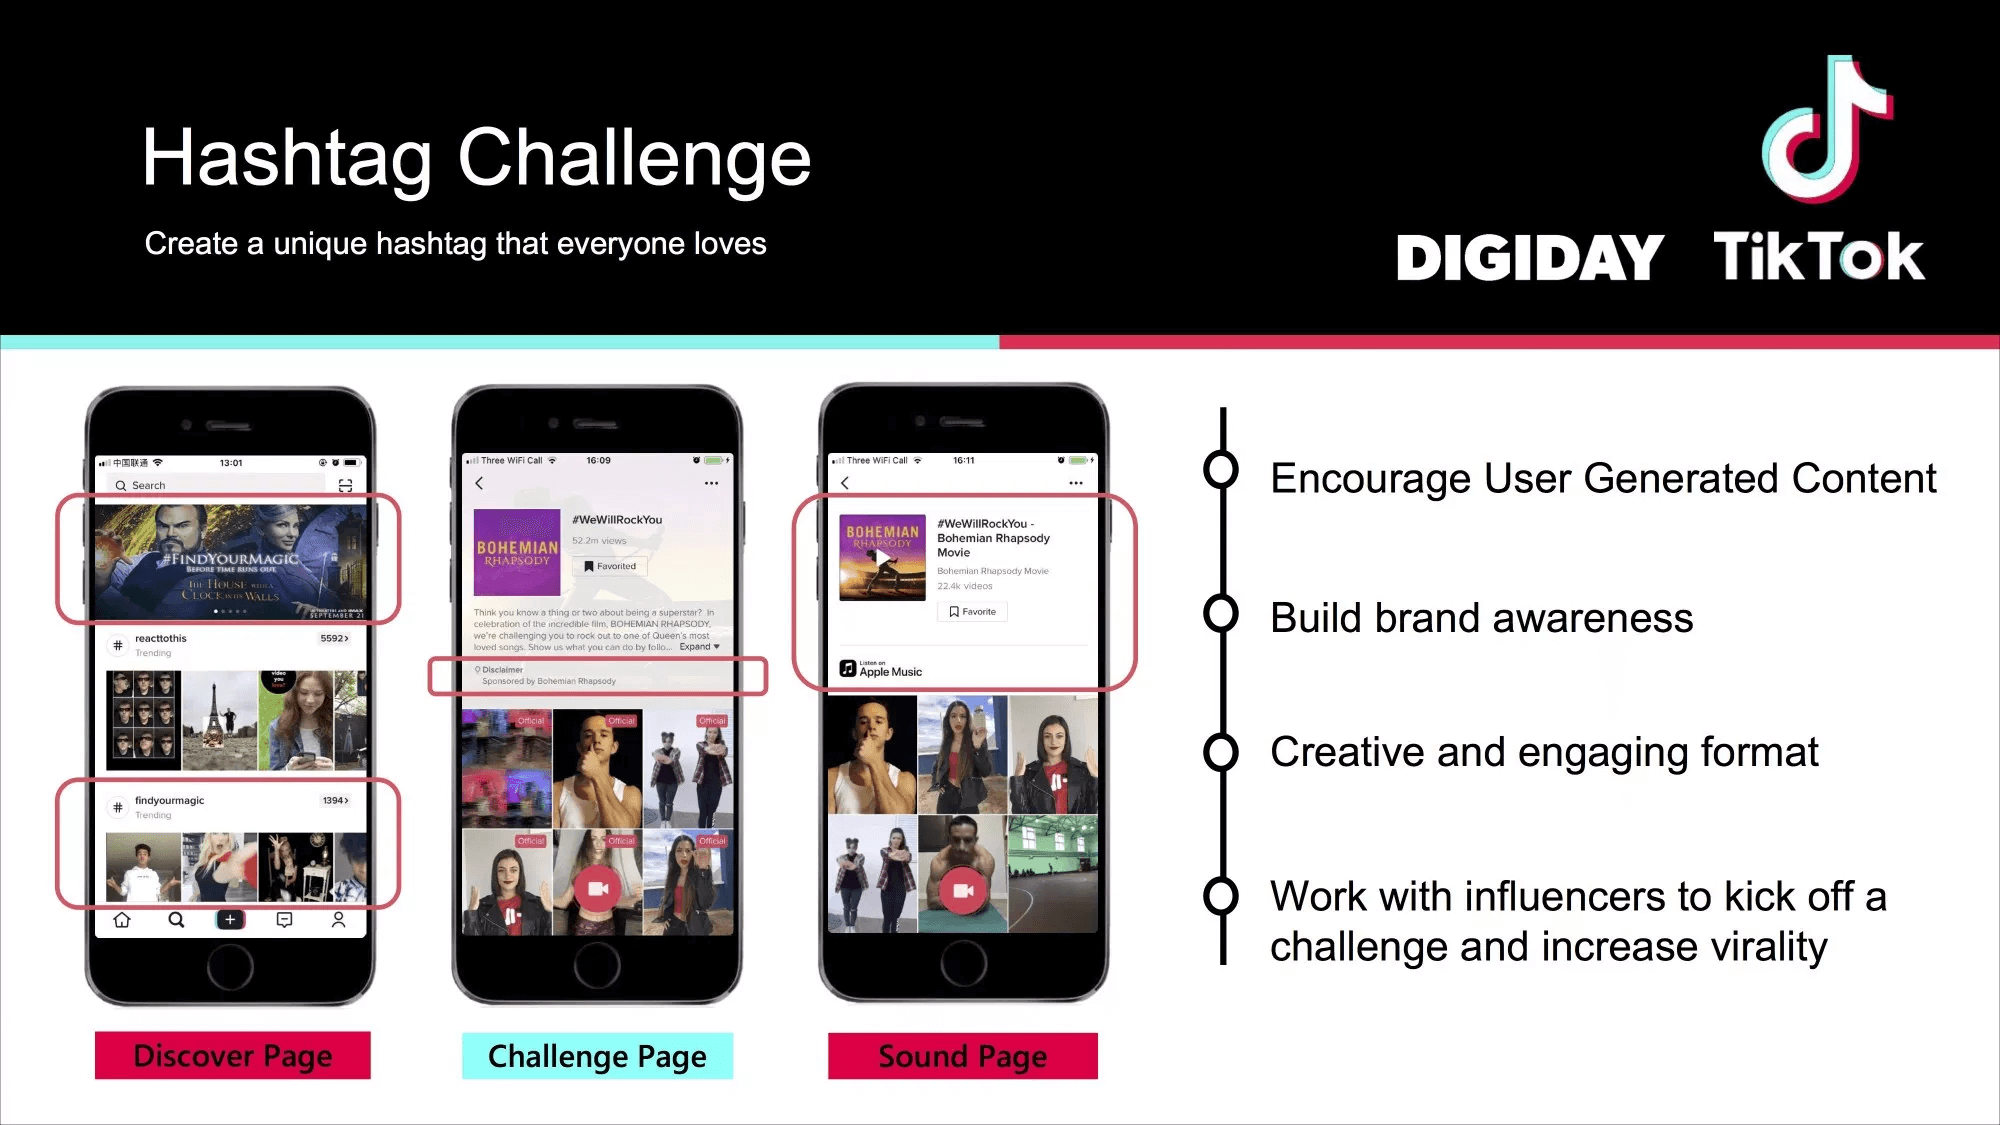 tiktok-hashtag-challenge